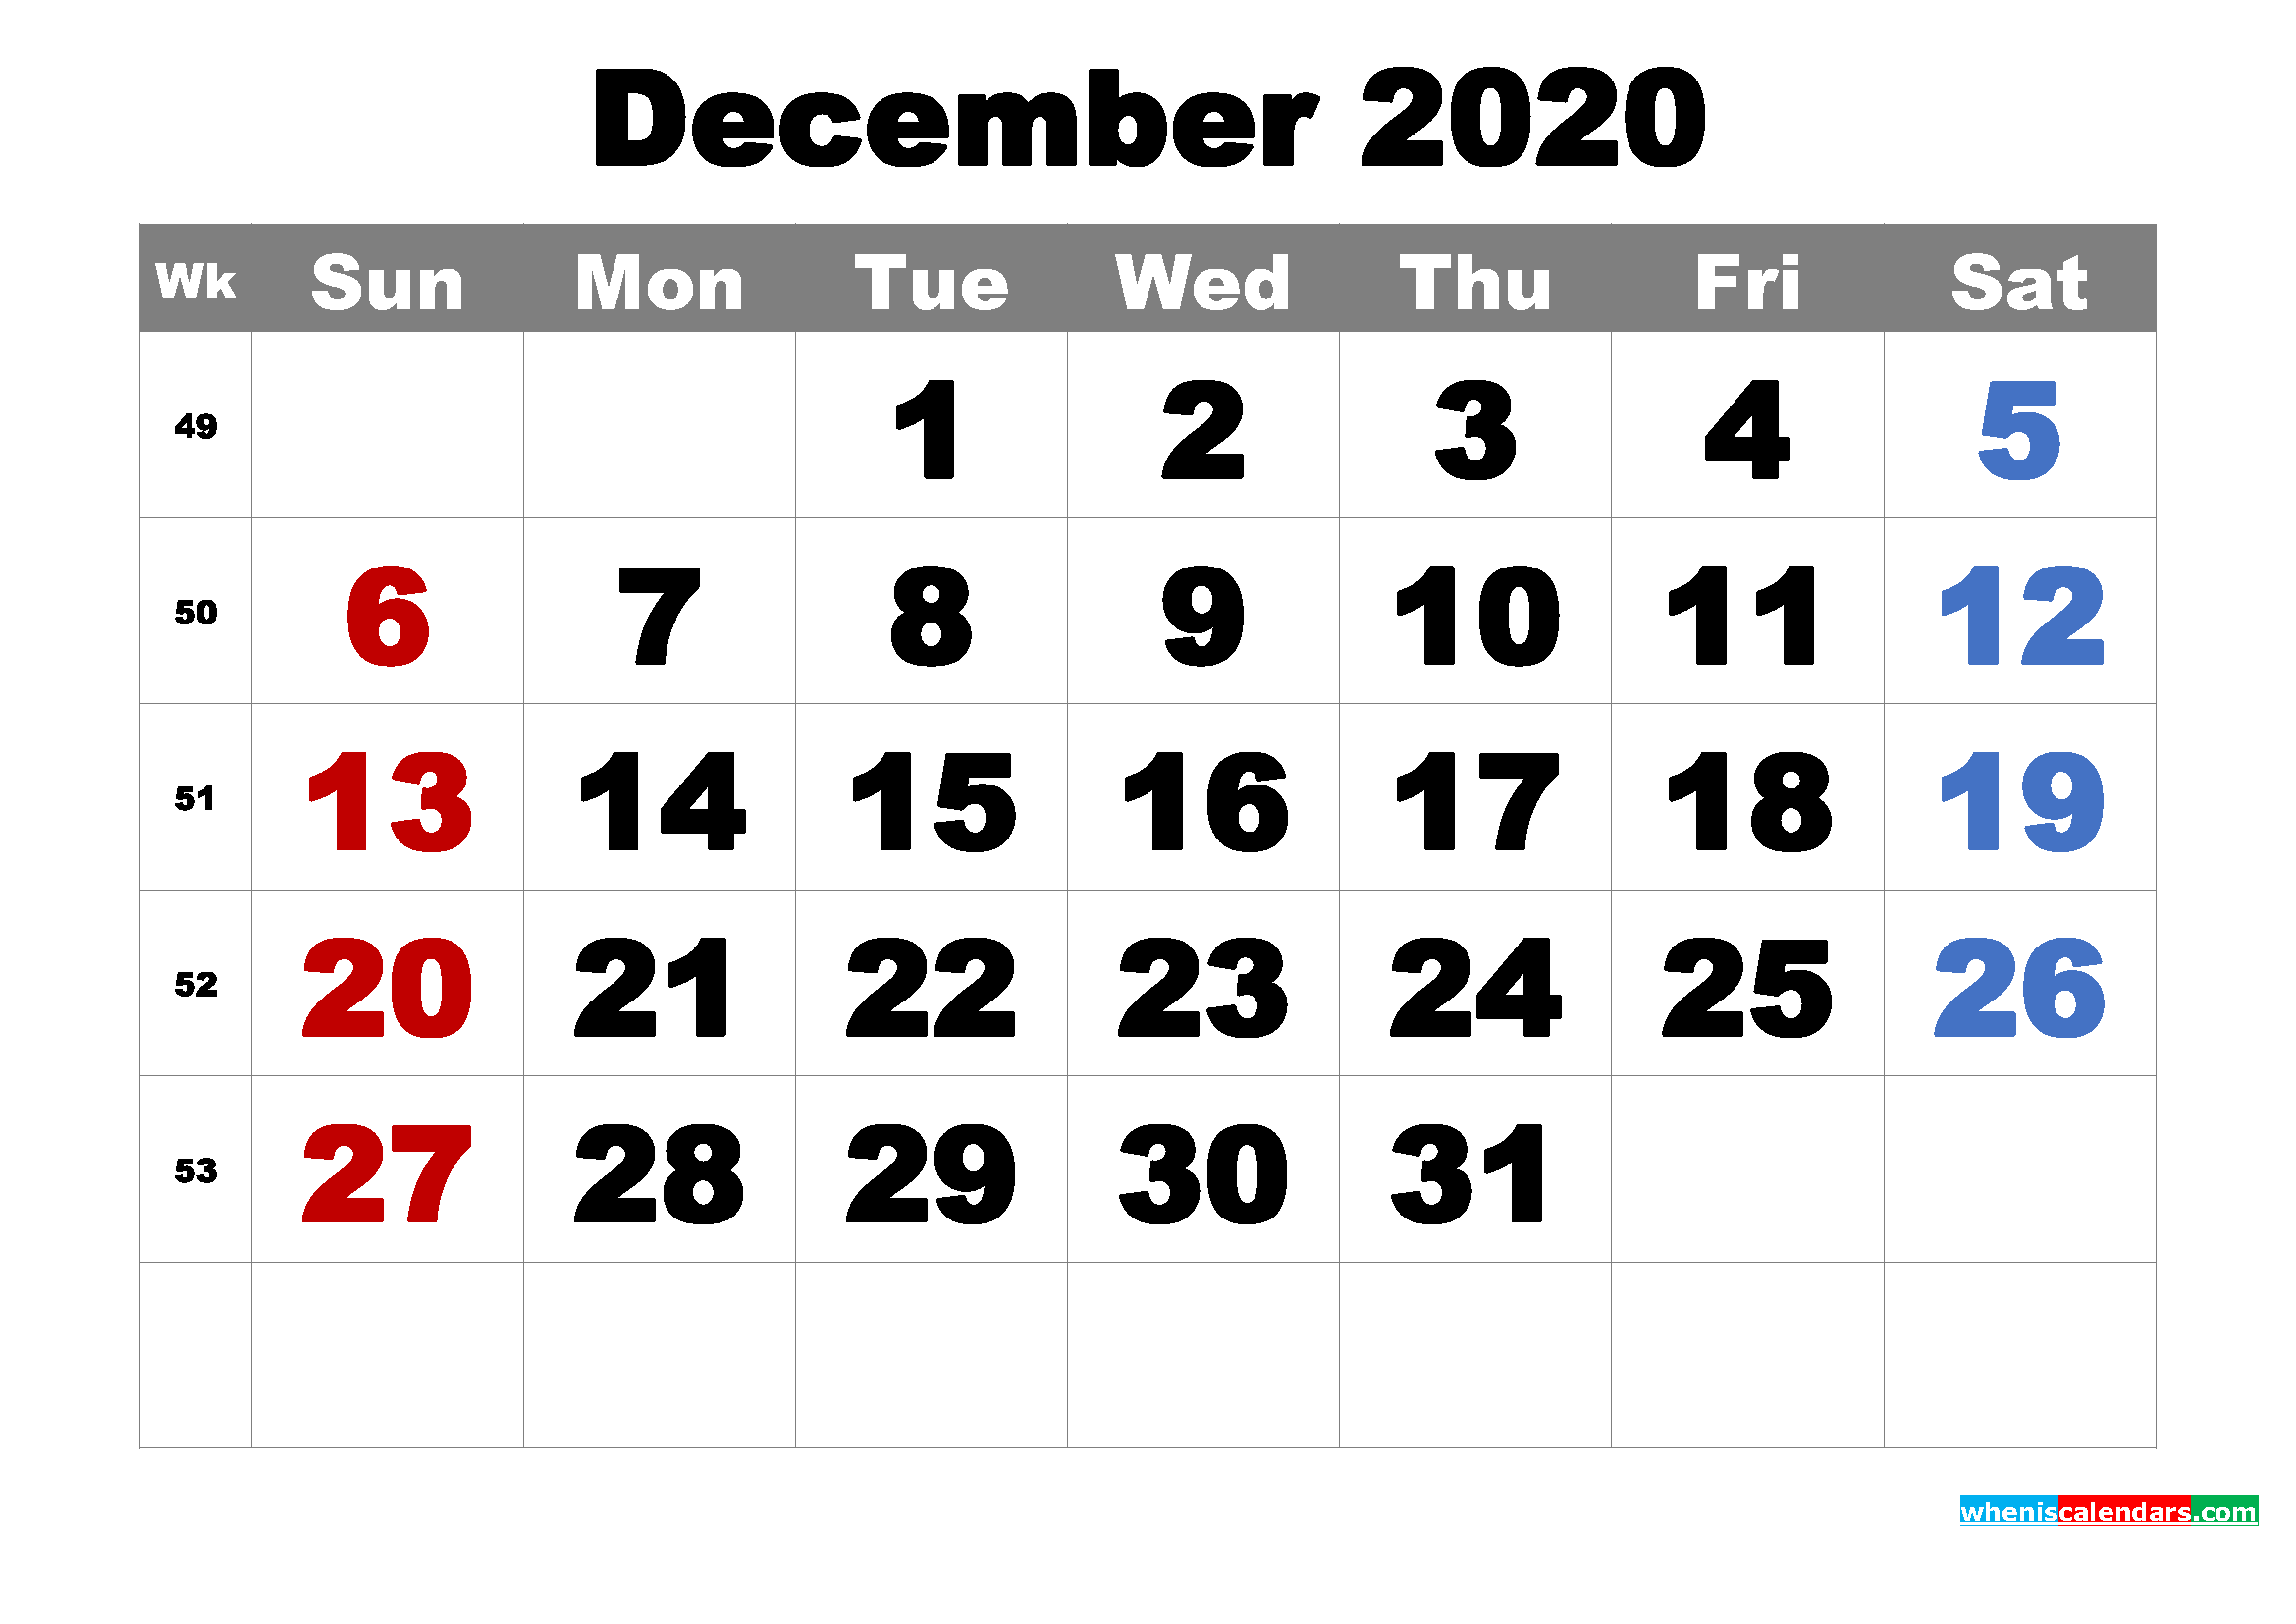 Free Printable December 2020 Calendar Word, PDF, Image ...